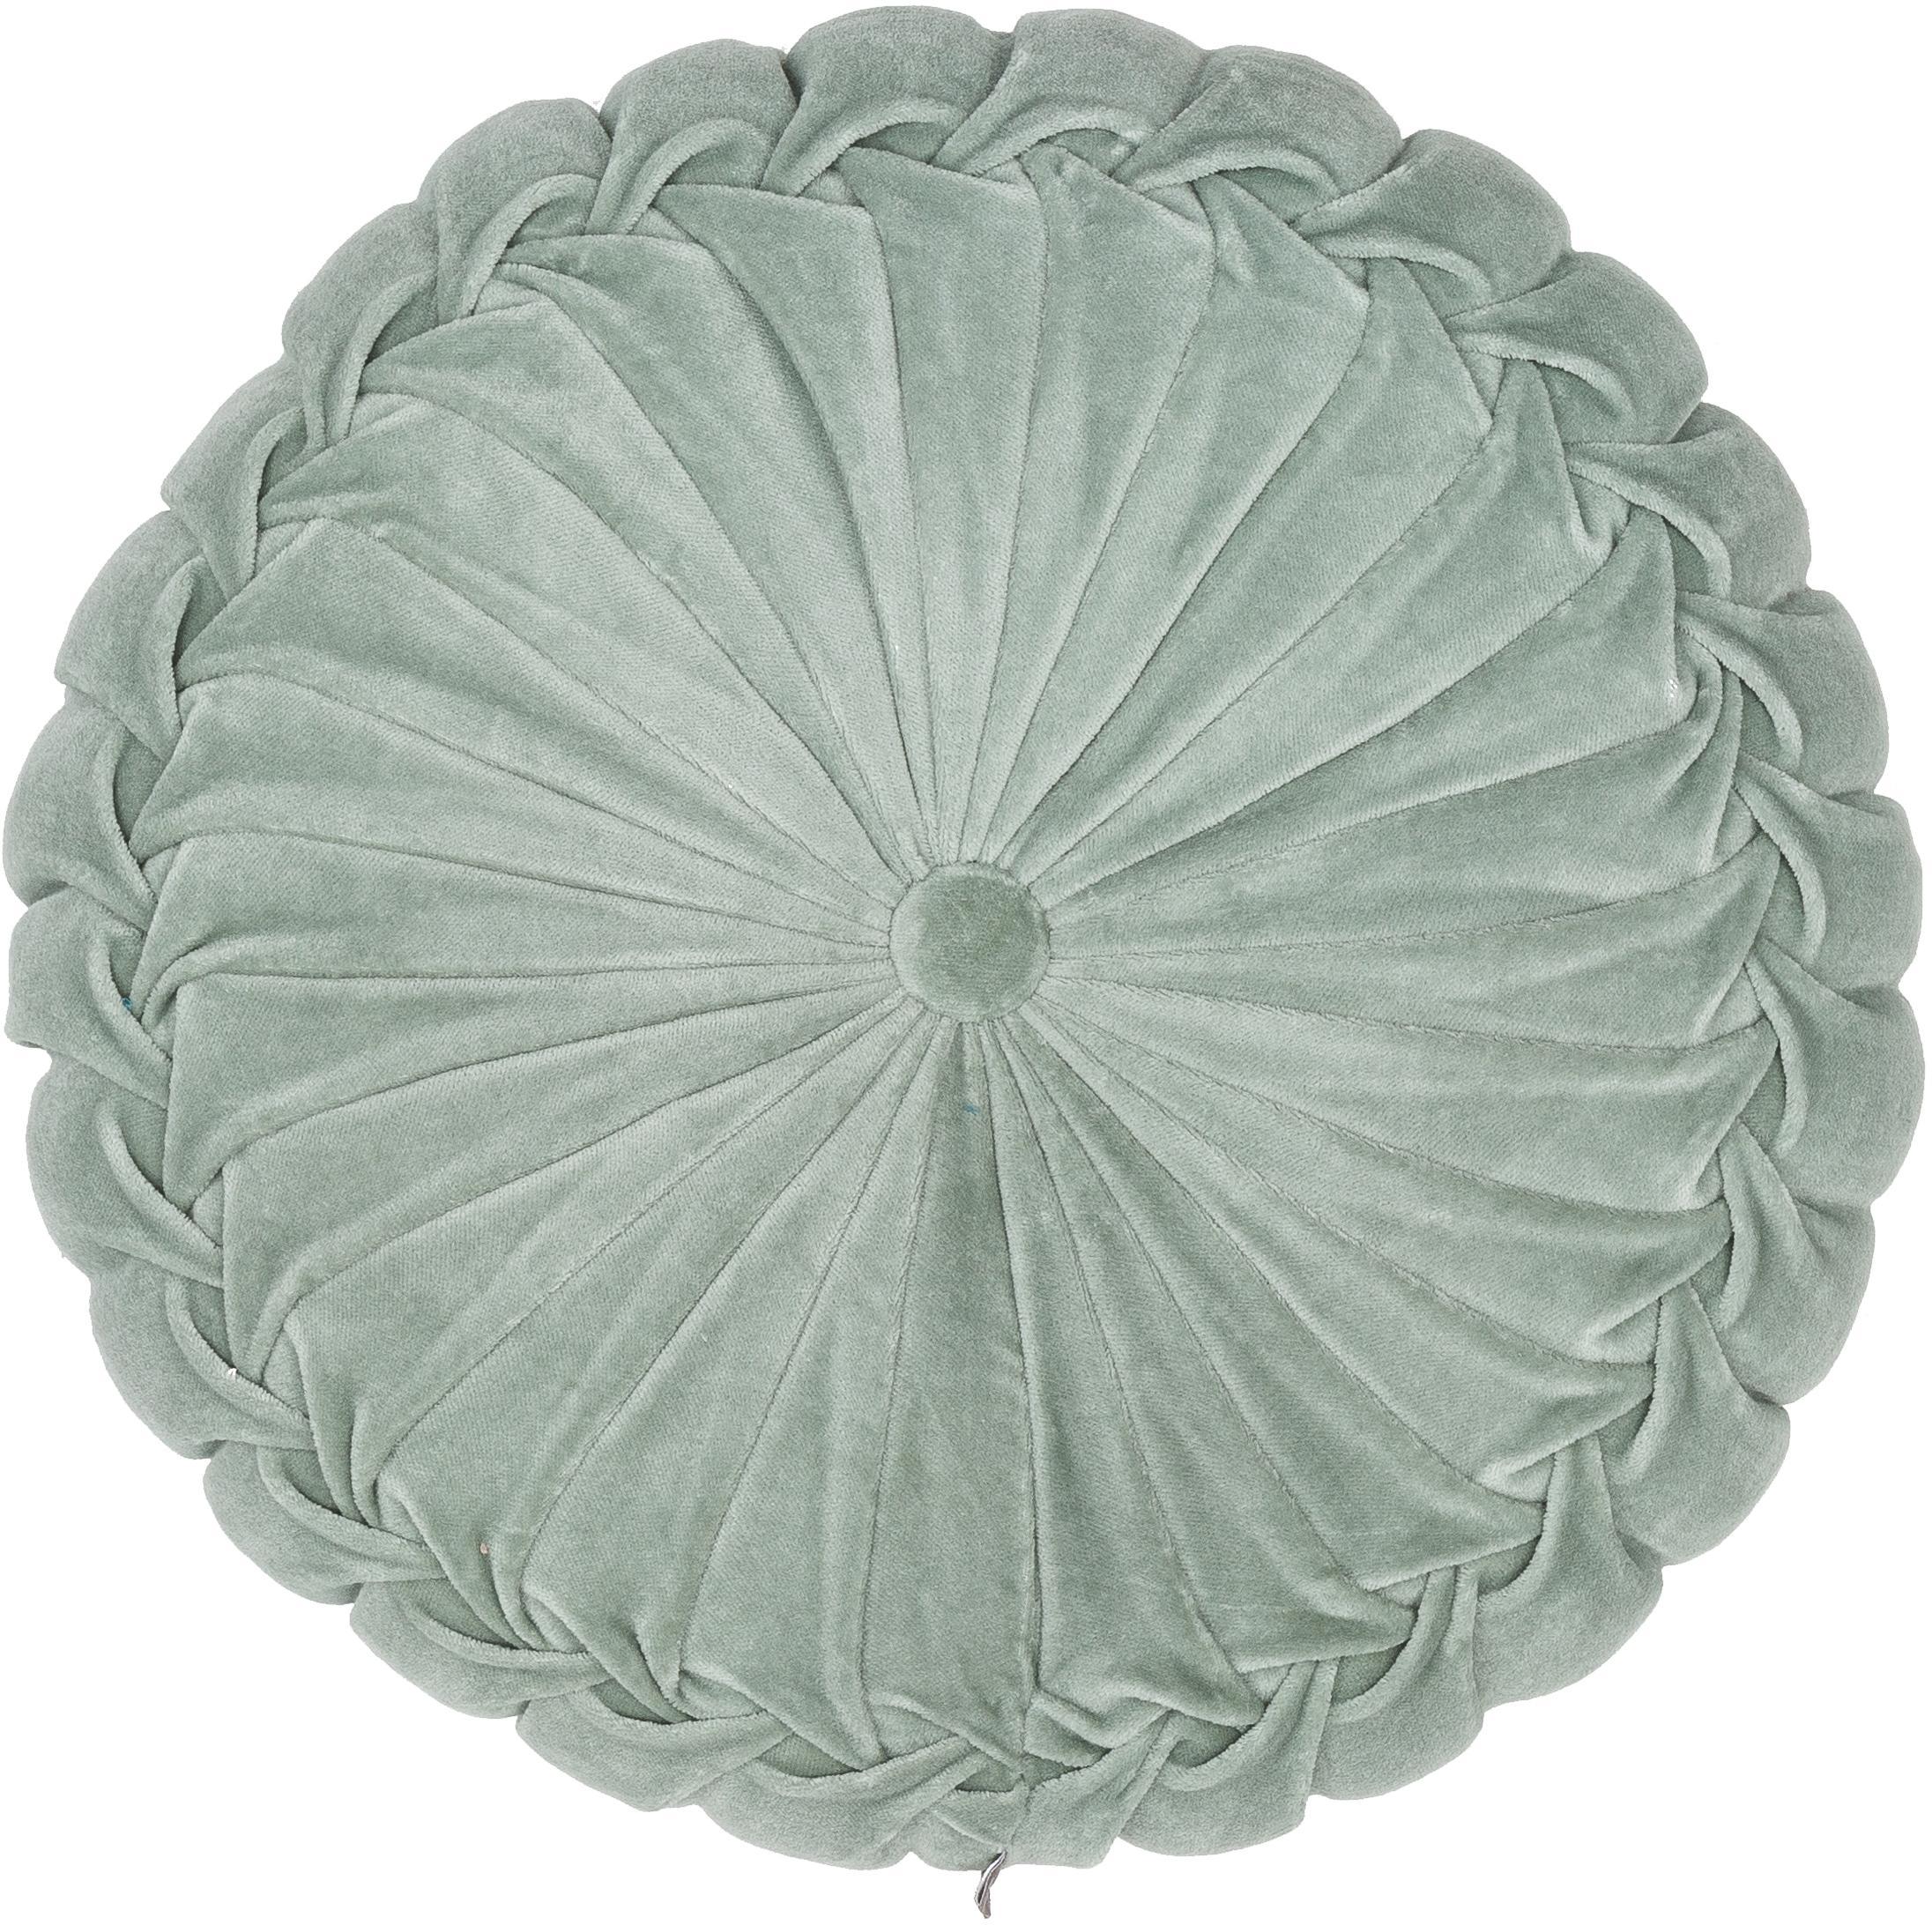 Cuscino con imbottitura in velluto rotondo Kanan, Velluto di cotone, Verde menta, Ø 40 x Alt. 10 cm